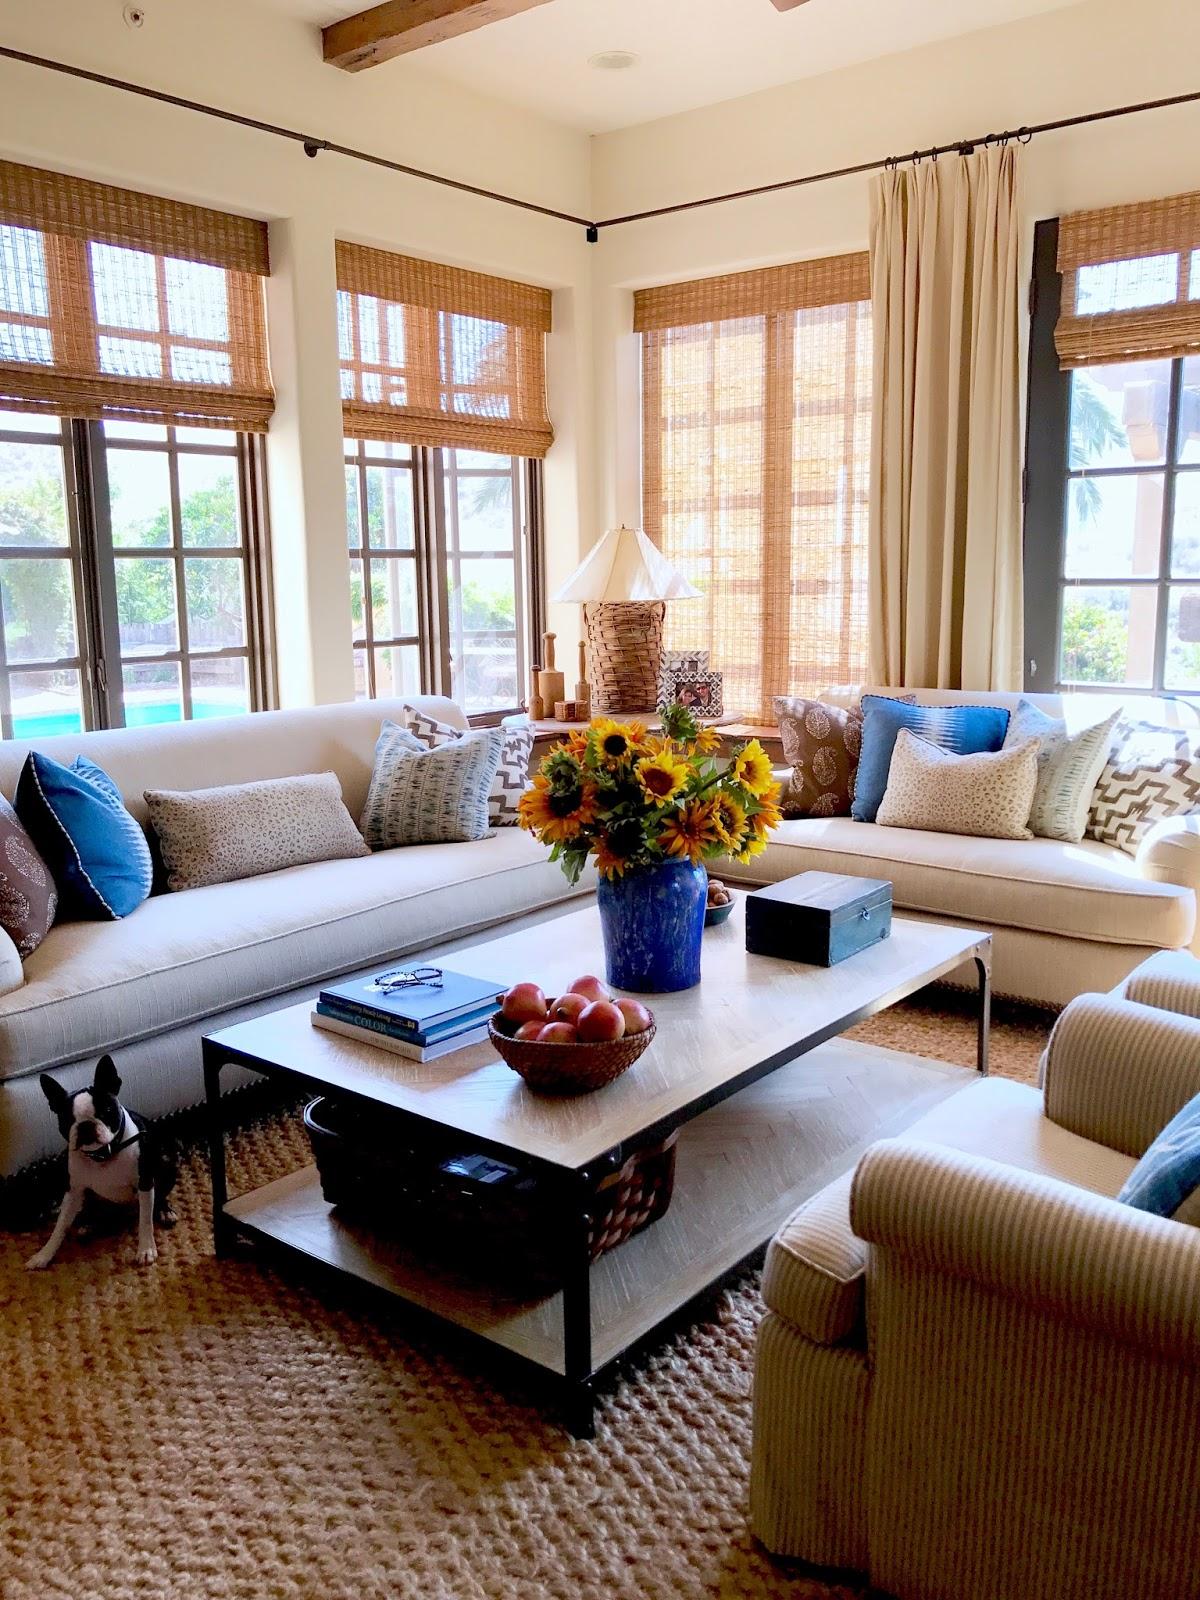 classic • casual • home: Modern Farmhouse Décor Ideas to ...